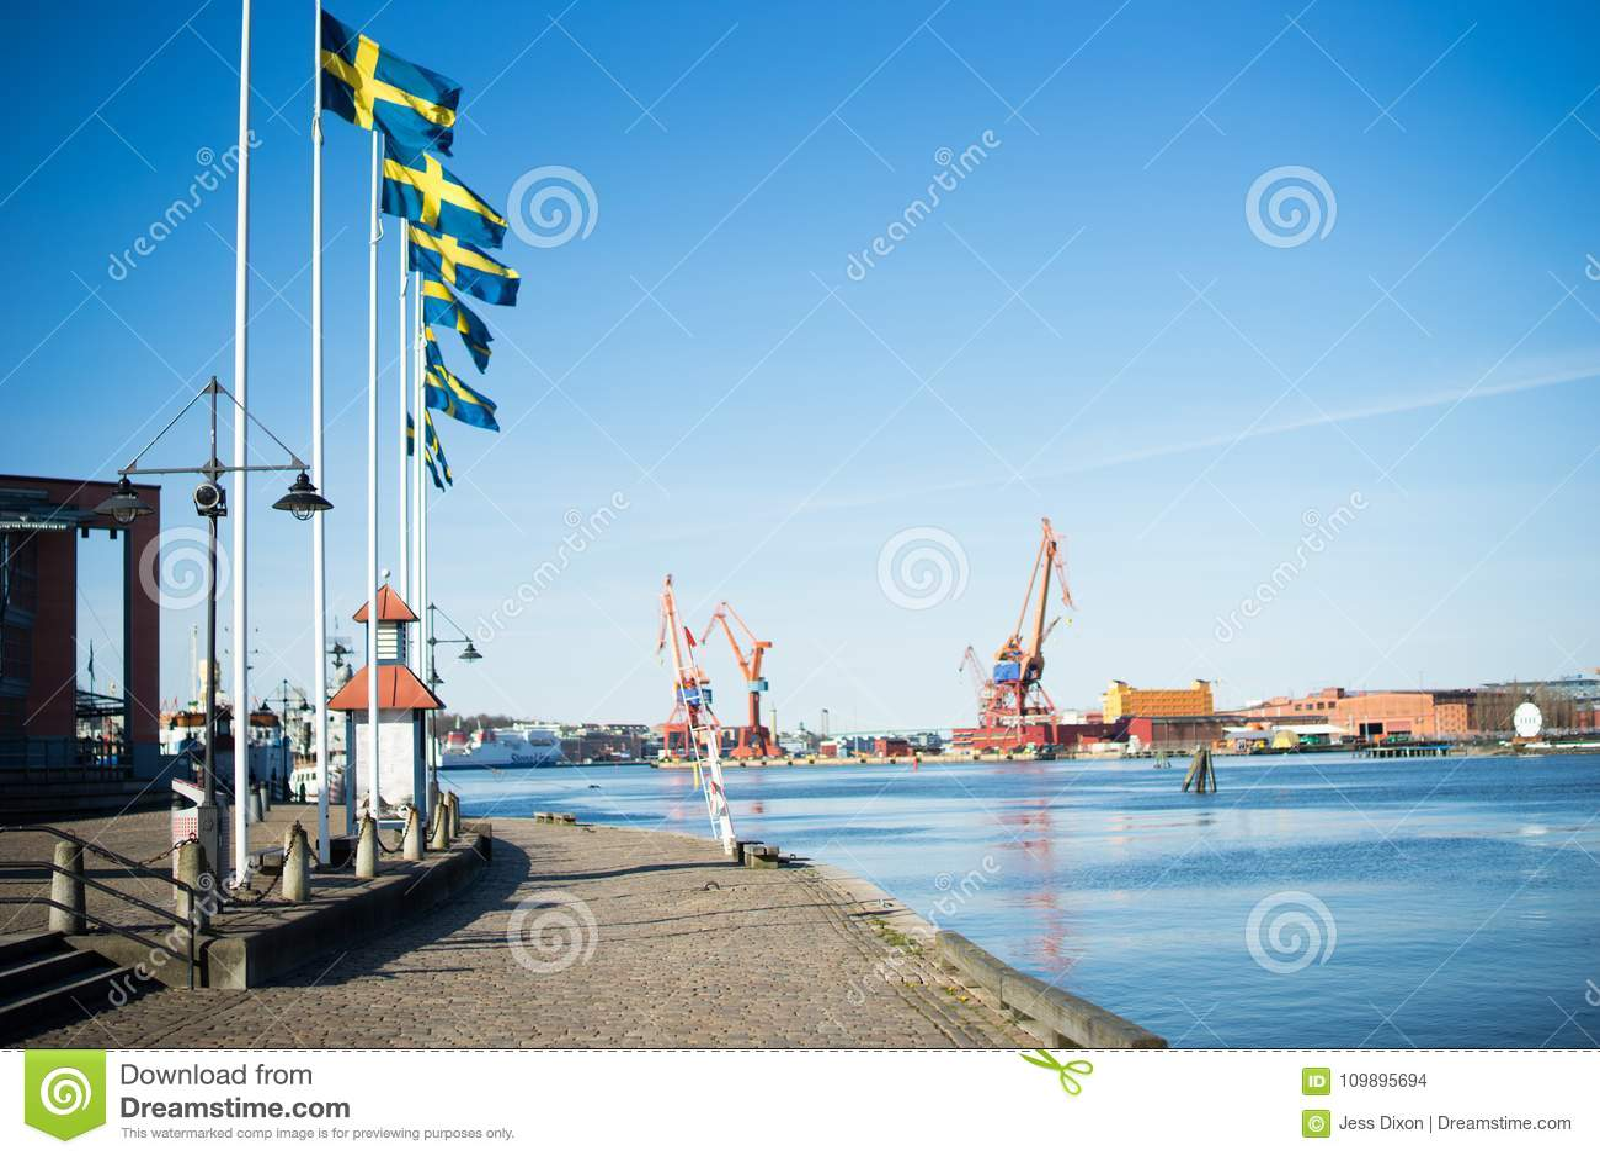 Zweedse Vlaggen die in de Haven van Gothenburg, Zweden vliegen